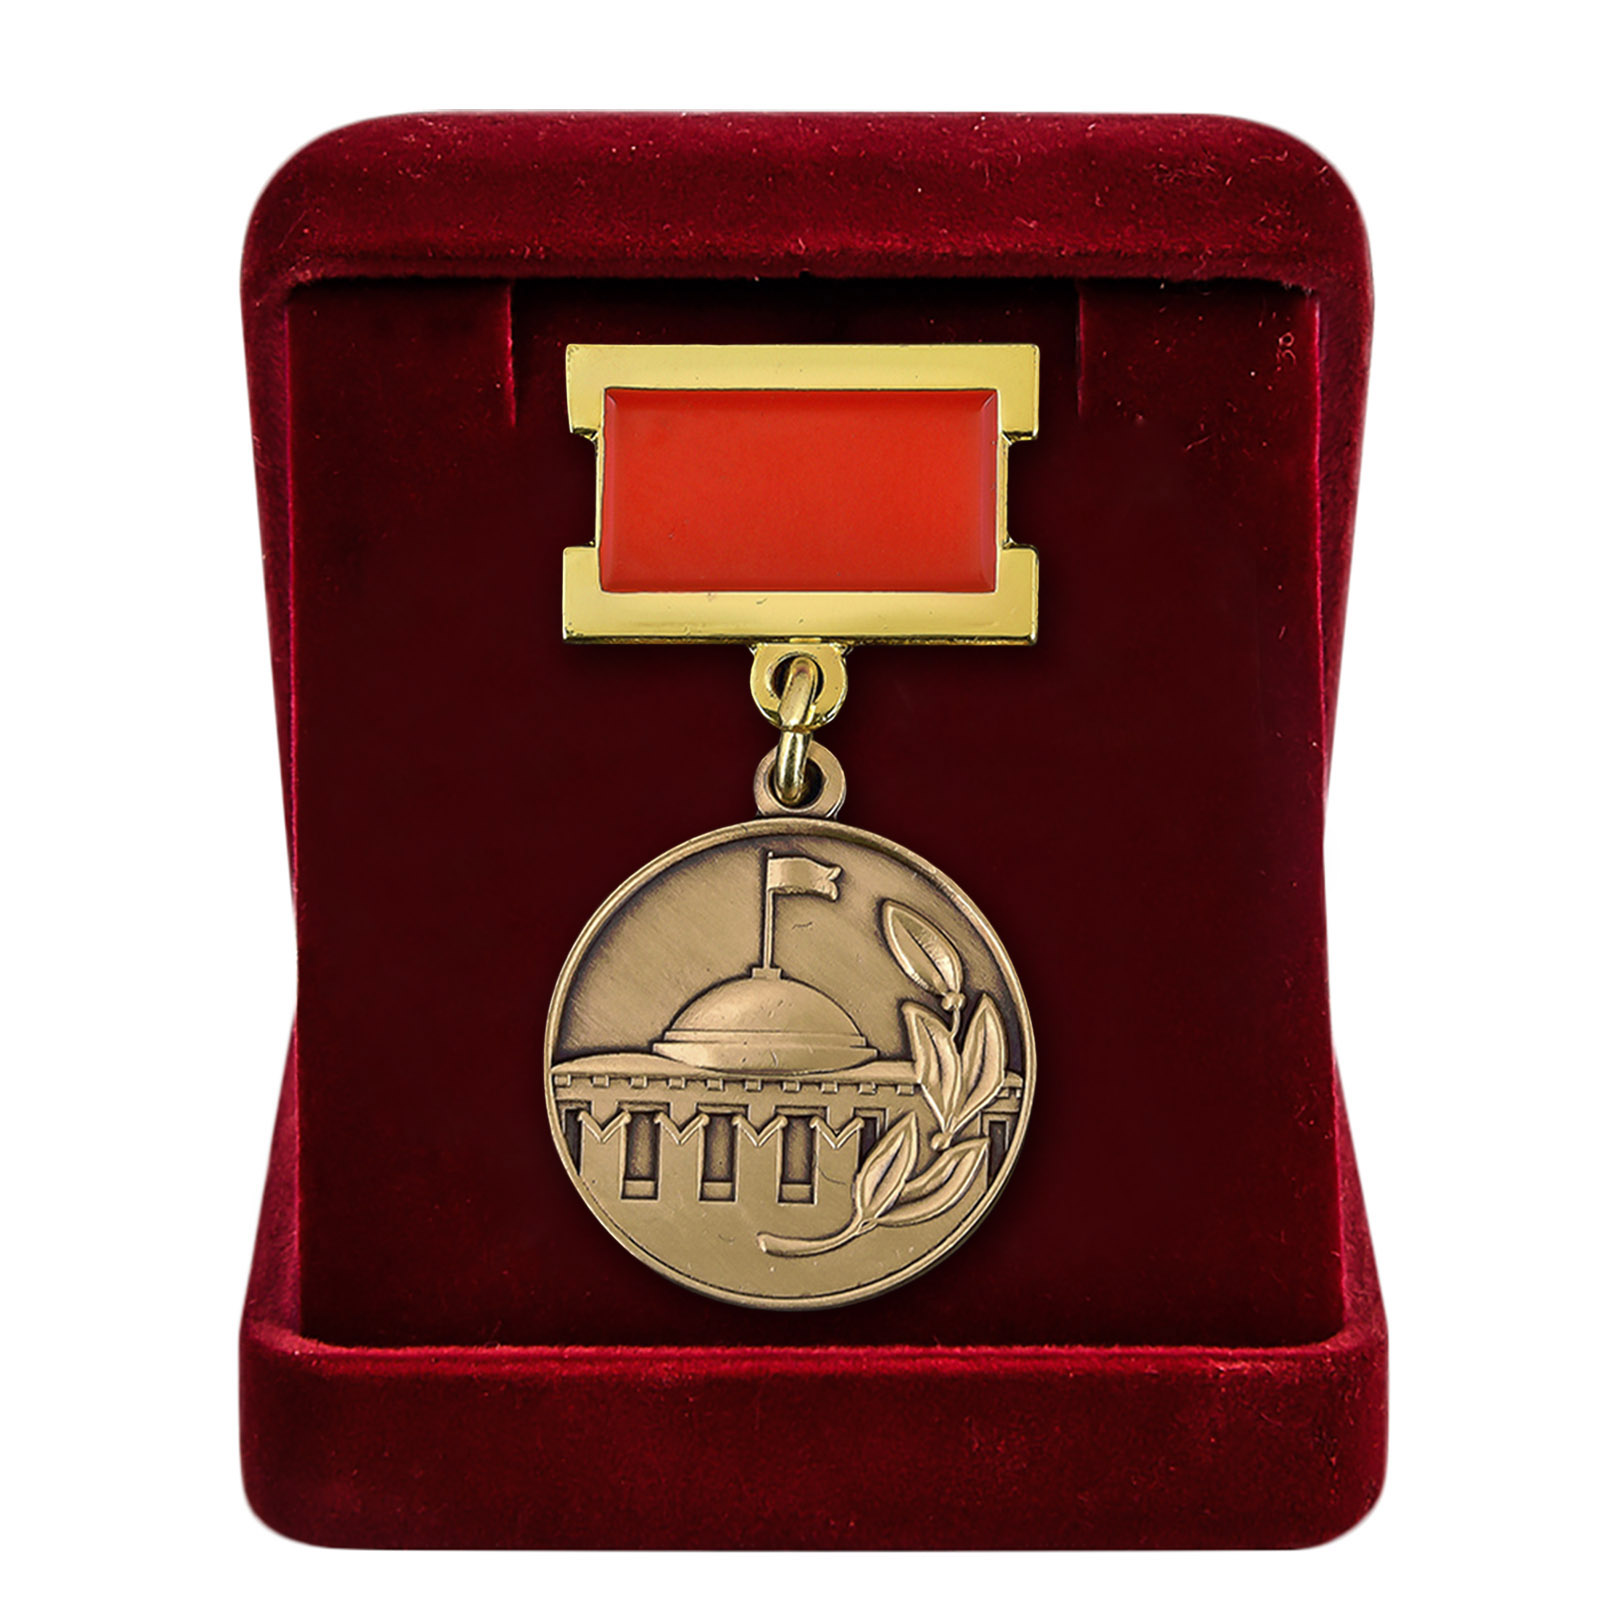 Знак Лауреата премии Совета Министров в бархатистом футляре